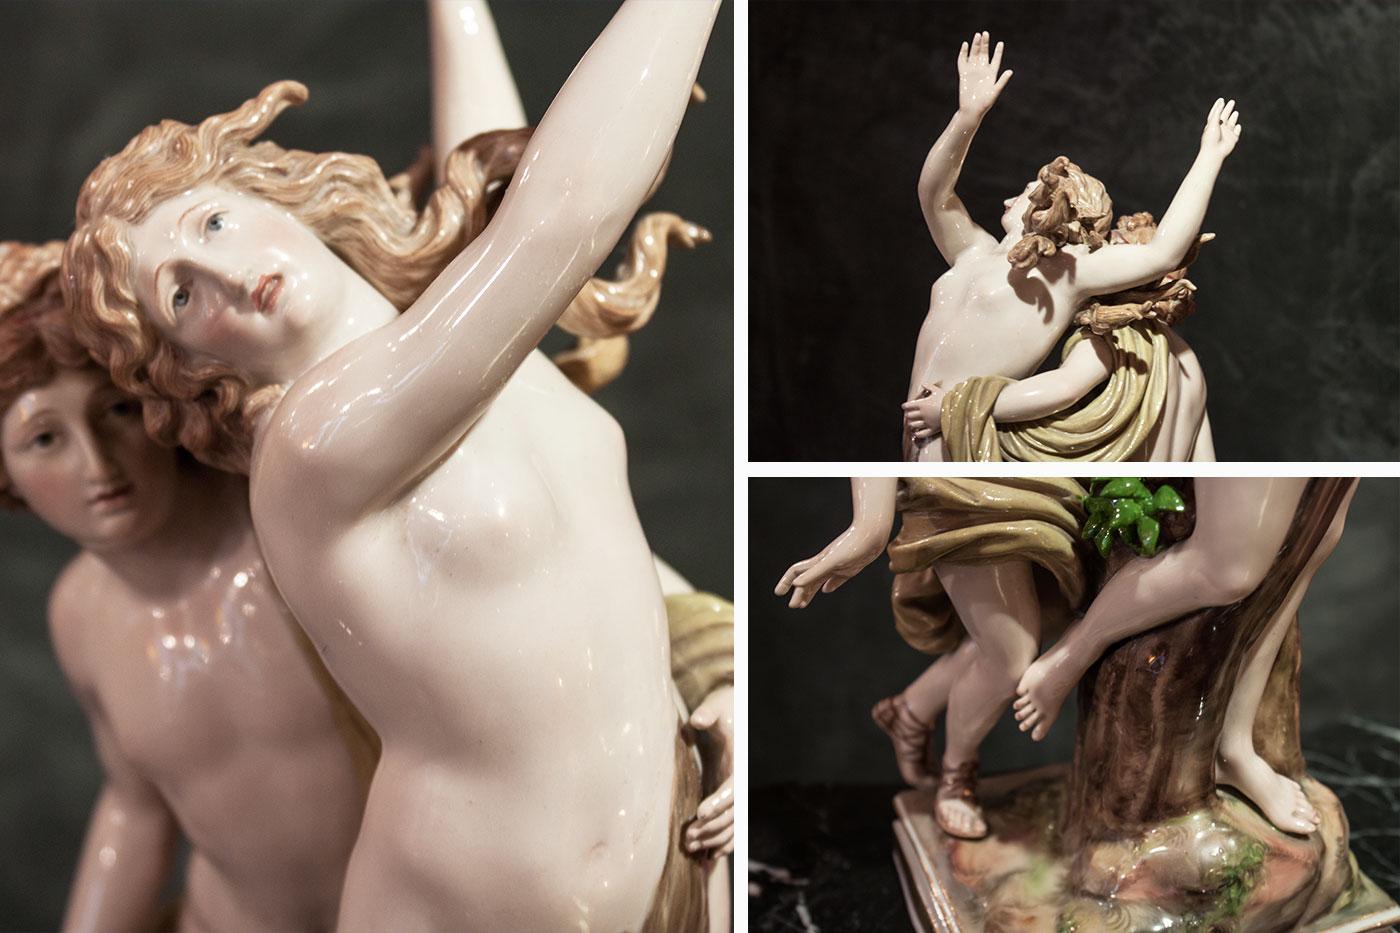 Porcellana Apollon et Daphné